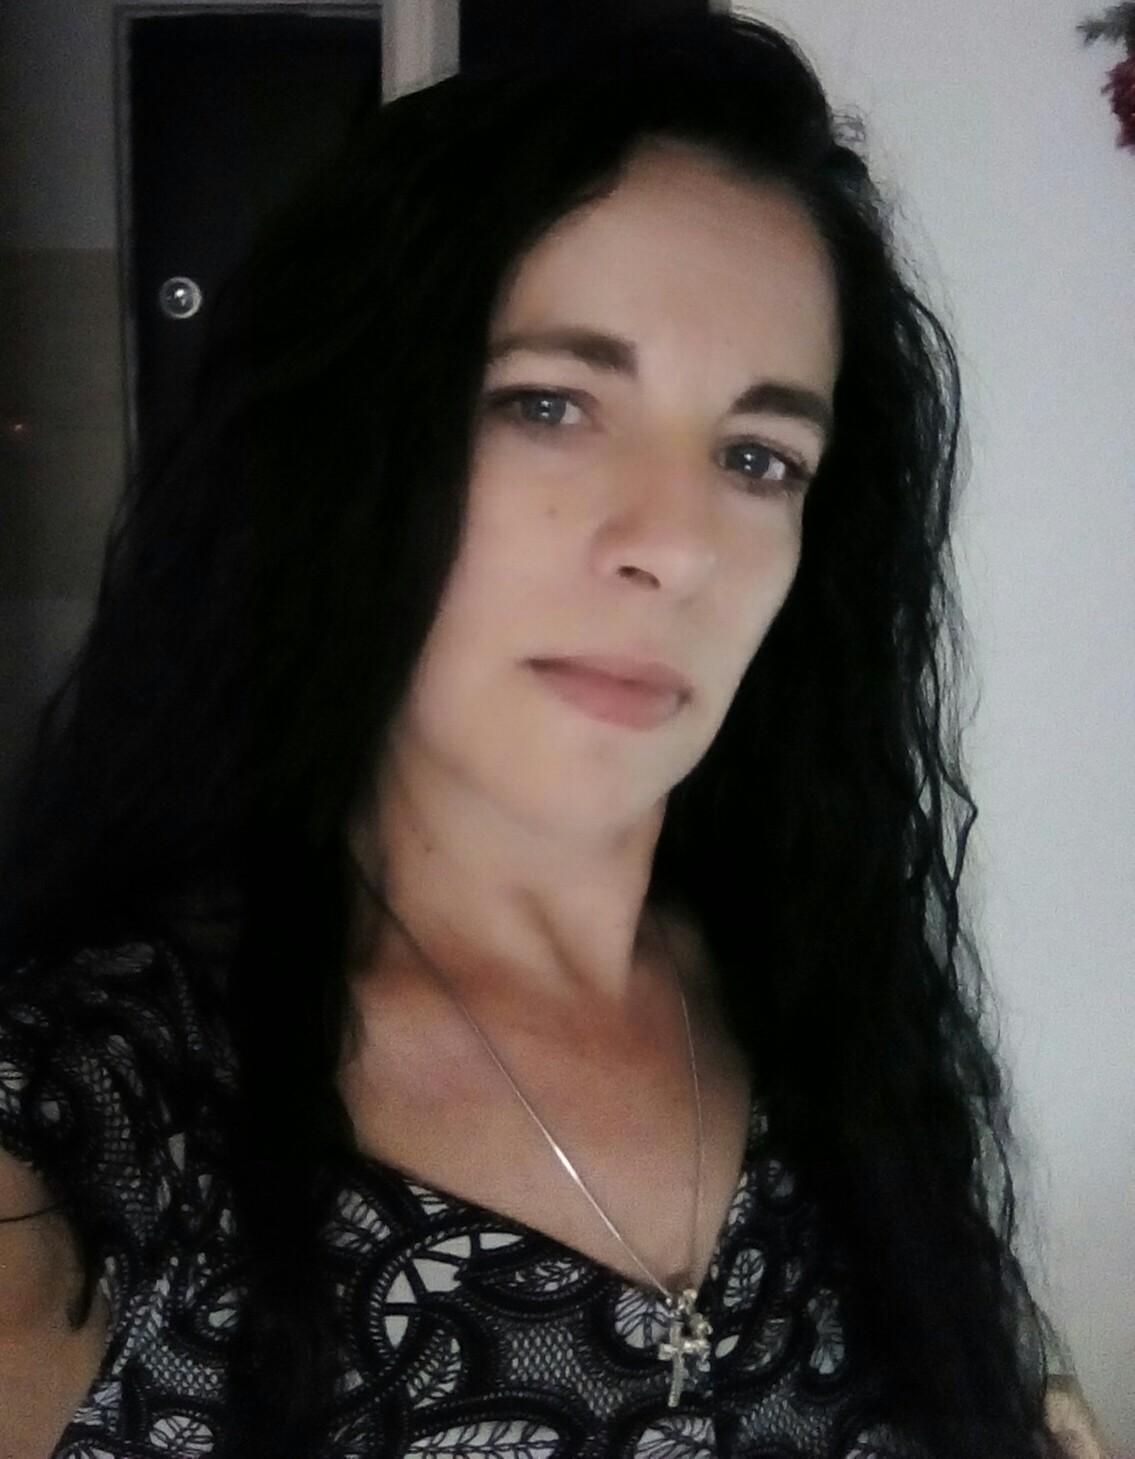 Anunturi erotice - eacorte braila. publi24 resita telefoane: escorte bucuresti non stop